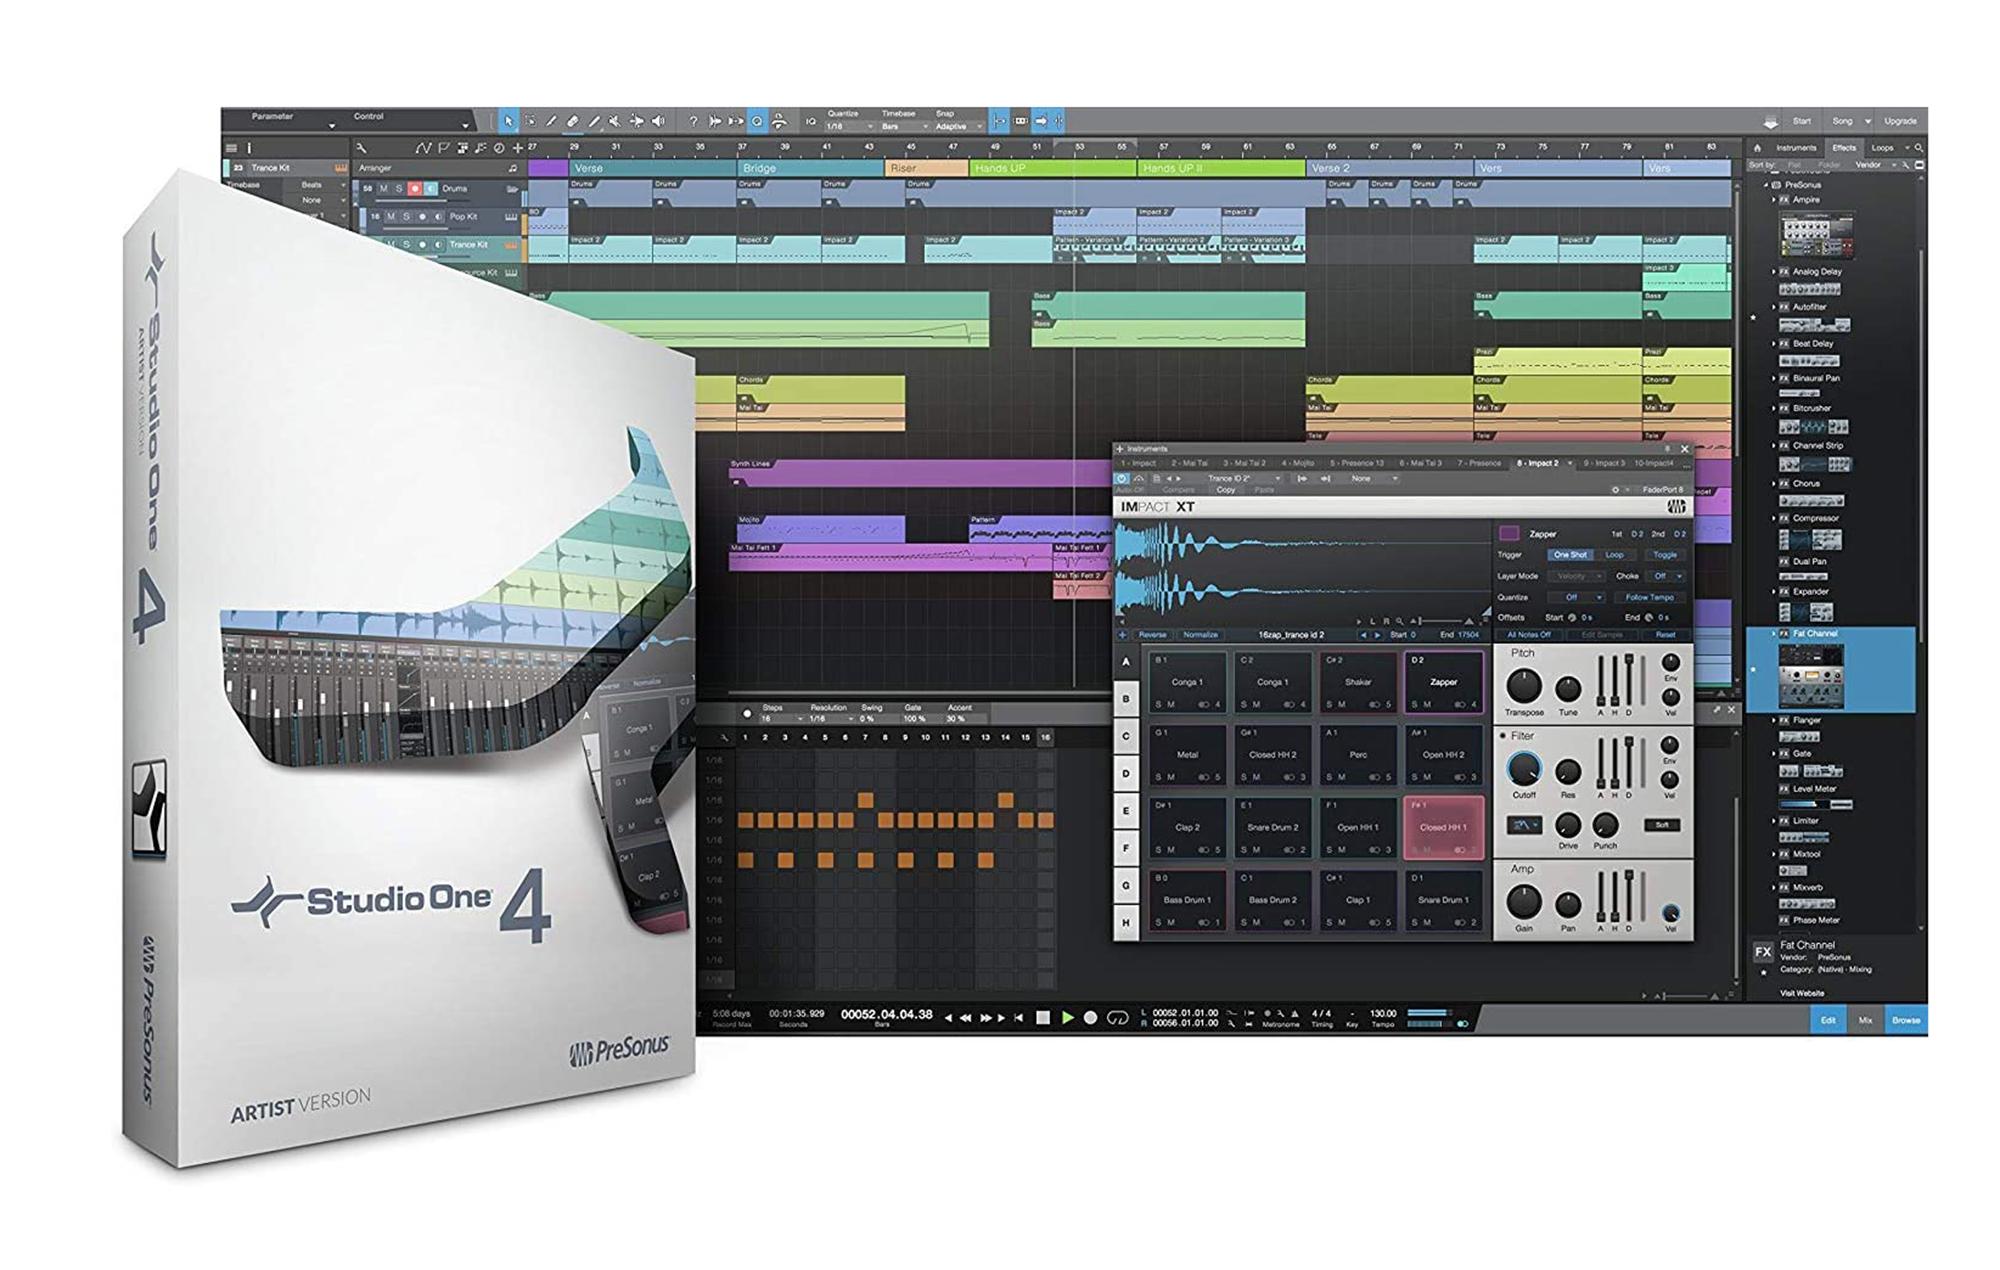 Studio One Artist DAW software